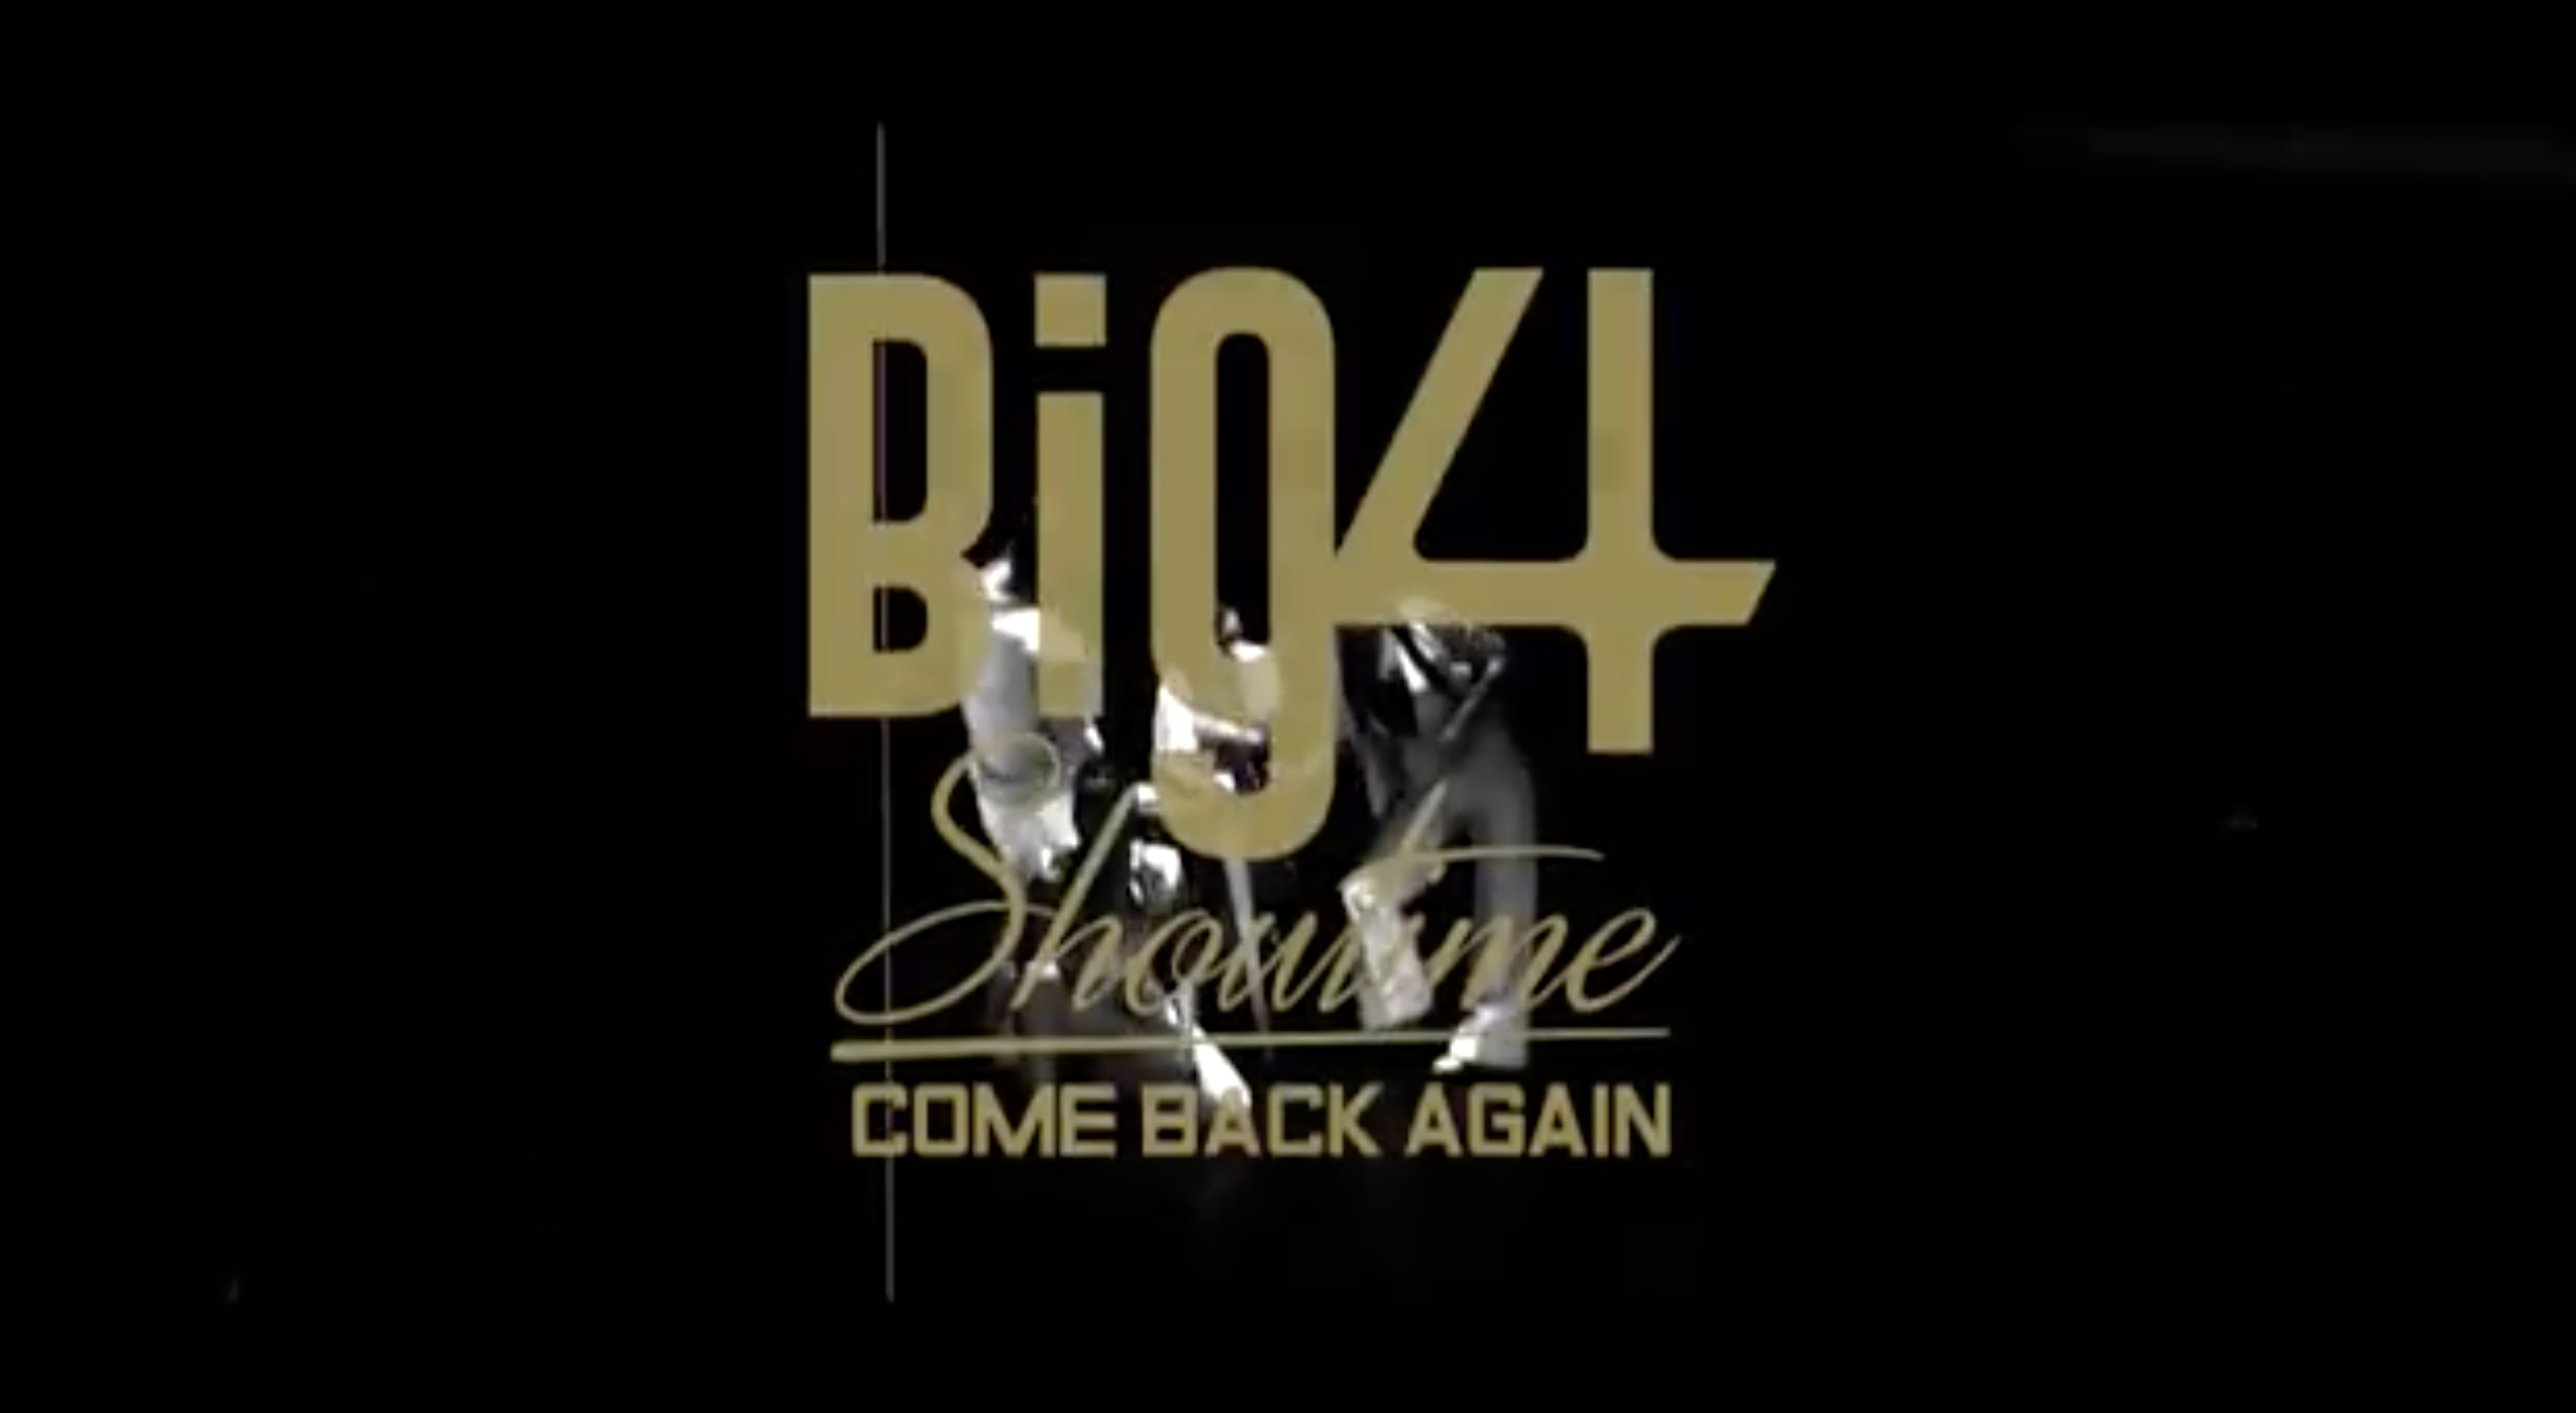 BIG4が帰ってくる!『BIG4 SHOWTIME』最新の告知動画を公開!!